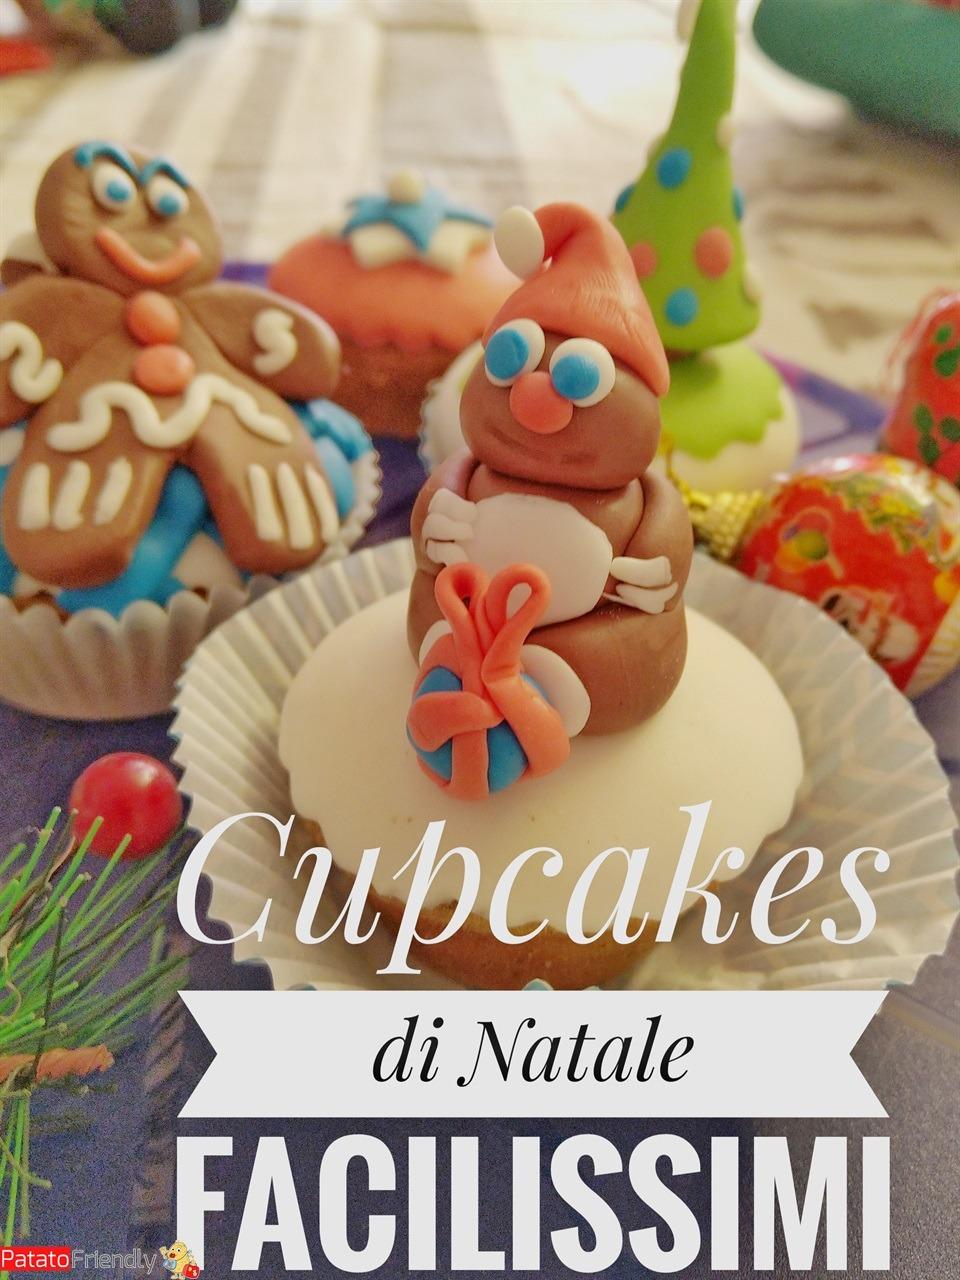 [cml_media_alt id='16324']Cupcake di Natale[/cml_media_alt]